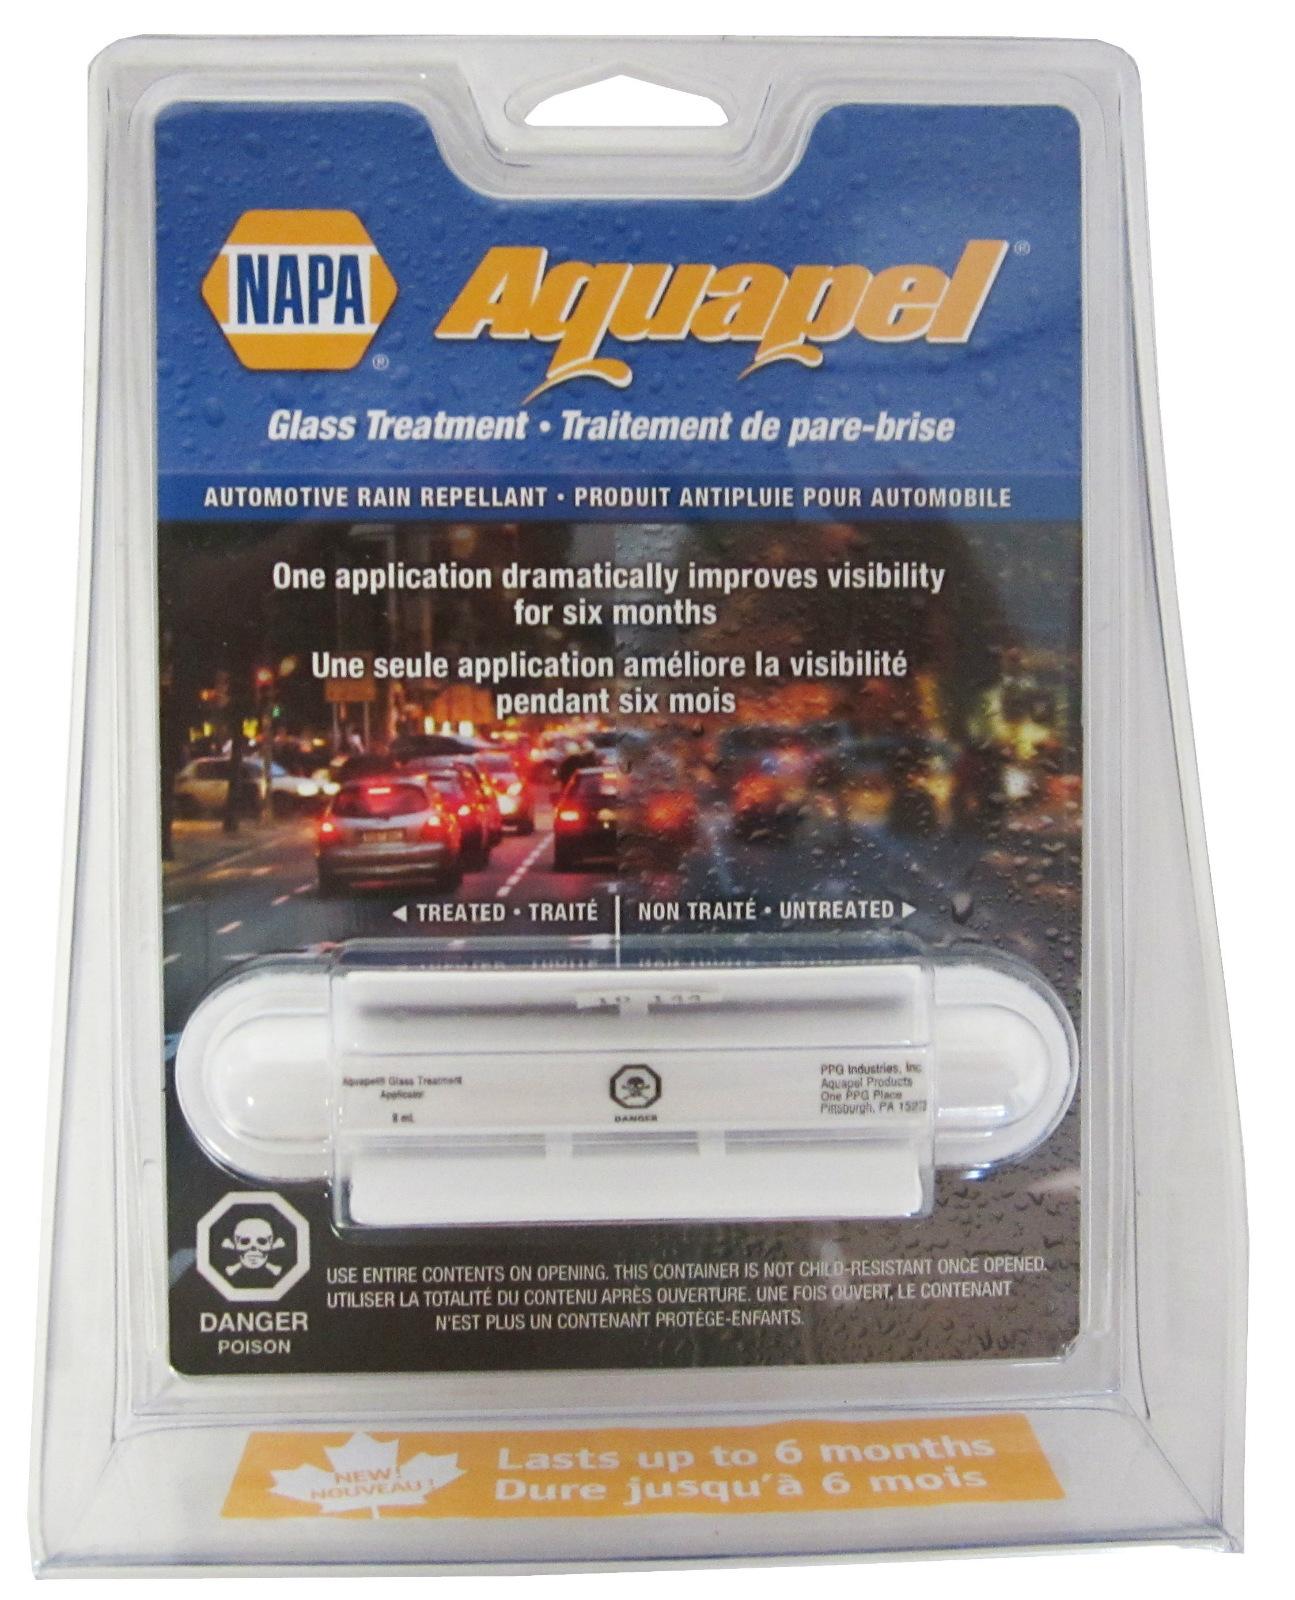 One New Napa Aquapel Windshield Glass Automotive Rain Repellant